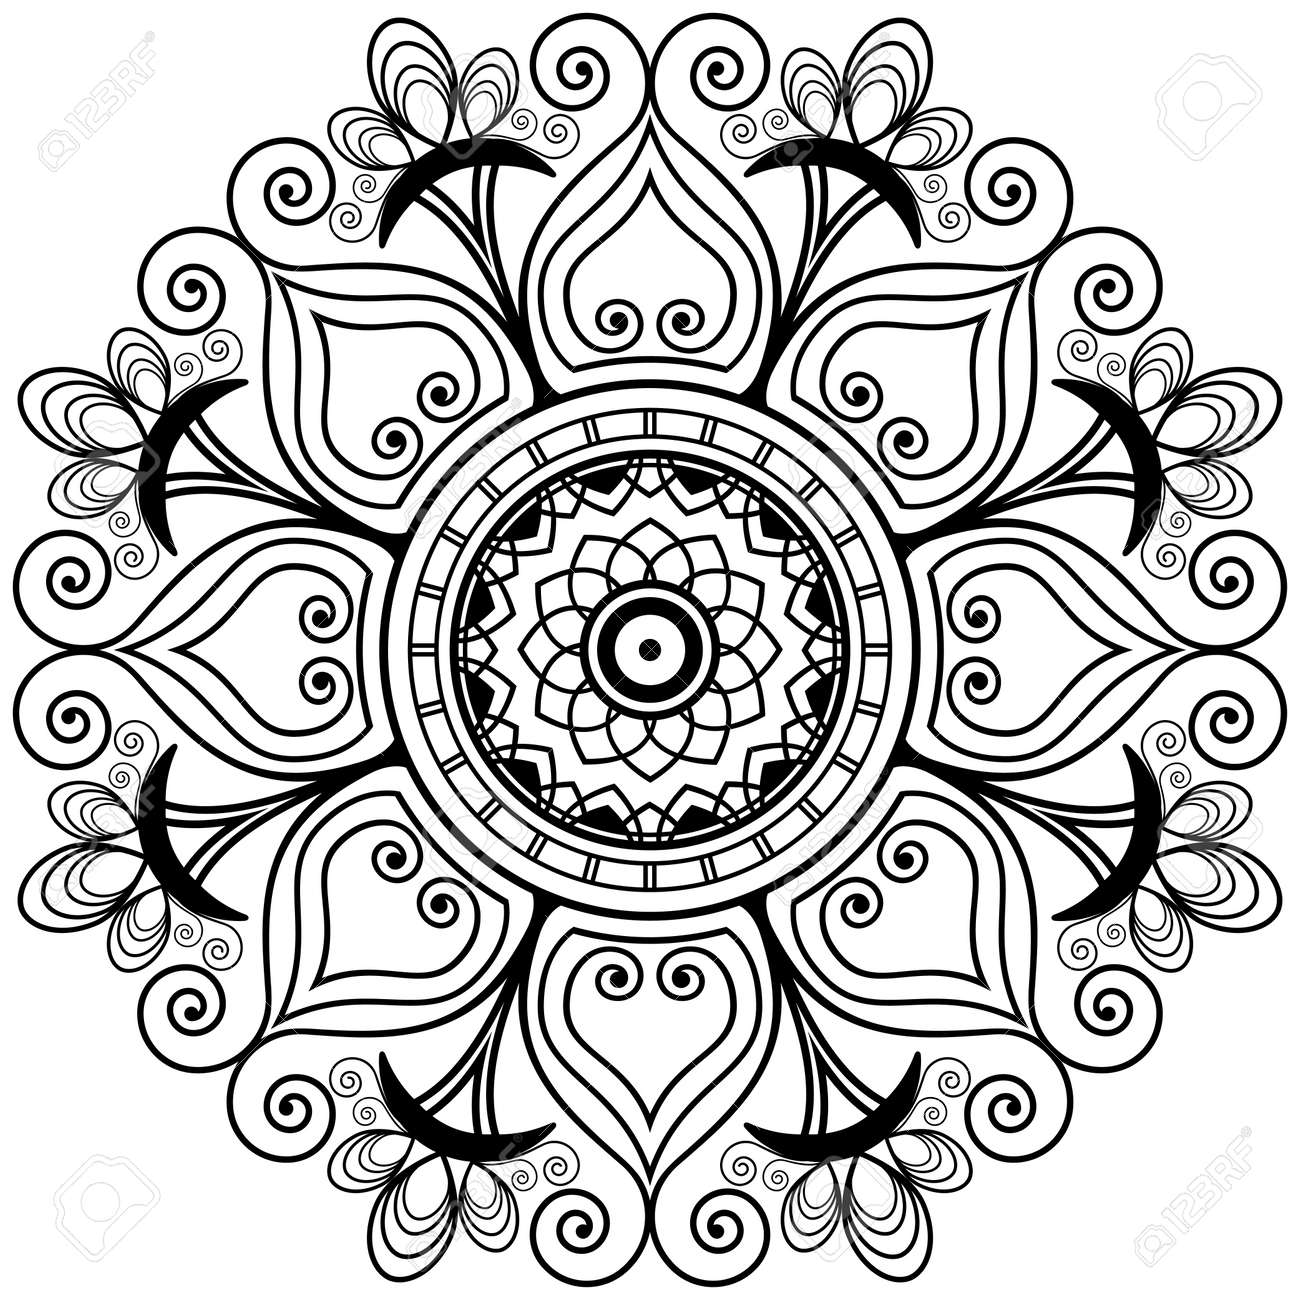 Henna tatoo mandala in mehndi style decorative pattern coloring henna tatoo mandala in mehndi style decorative pattern coloring book element vector floral junglespirit Gallery